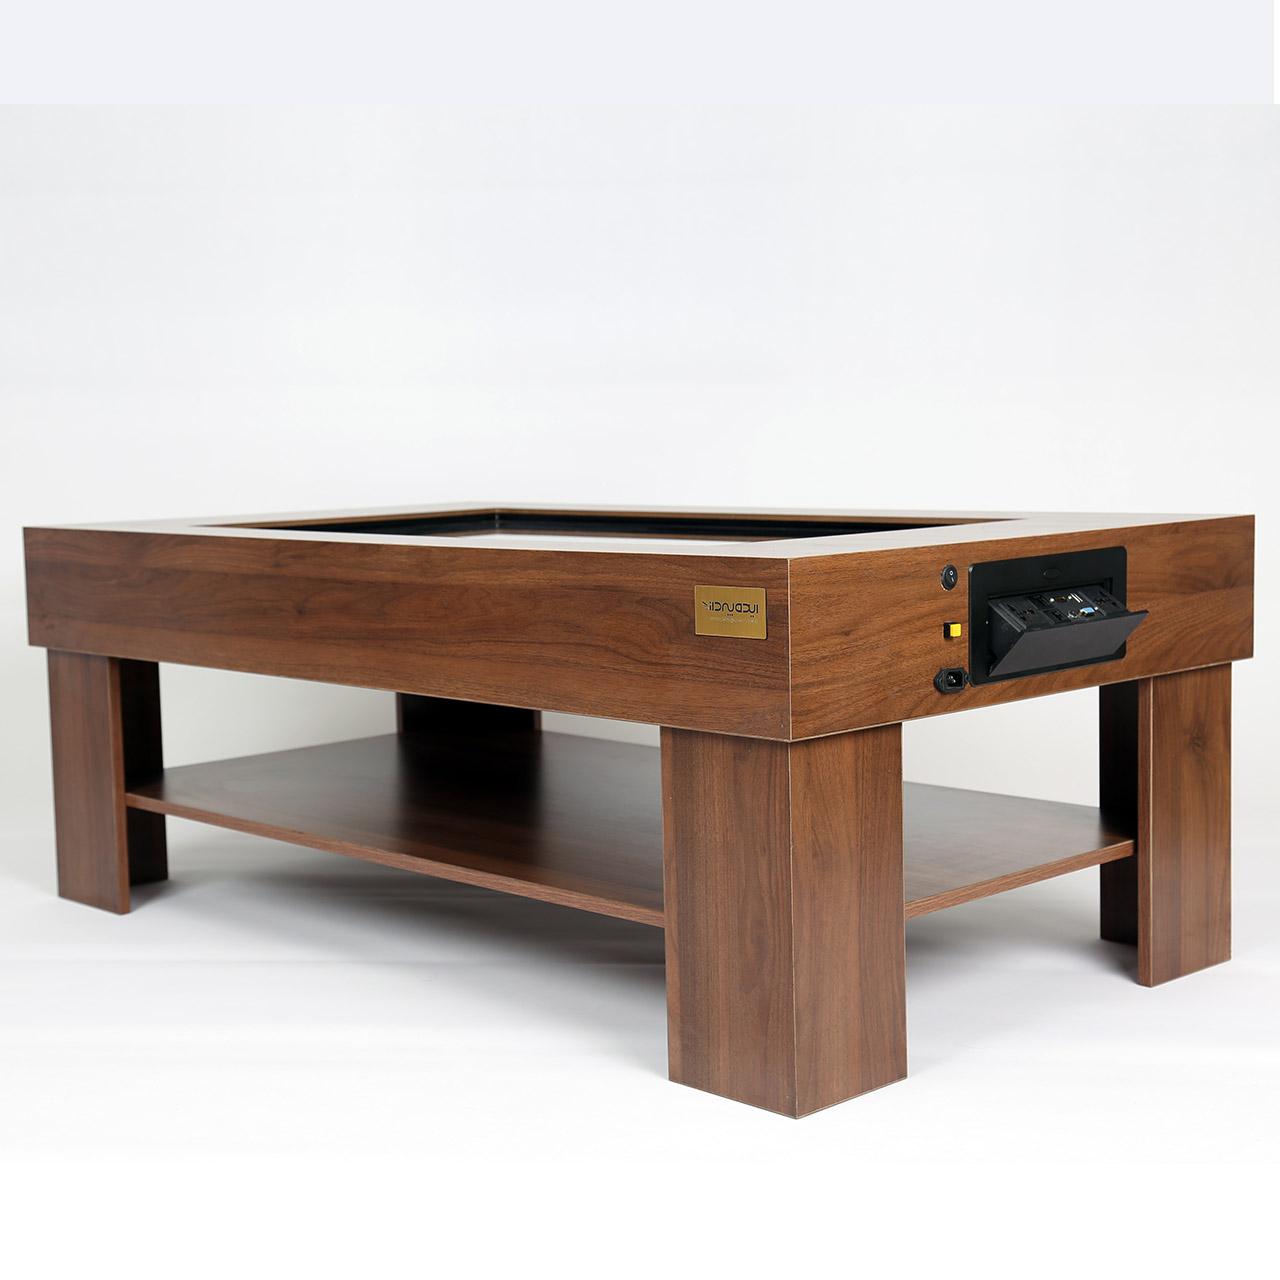 میز لمسی مدل T201-43